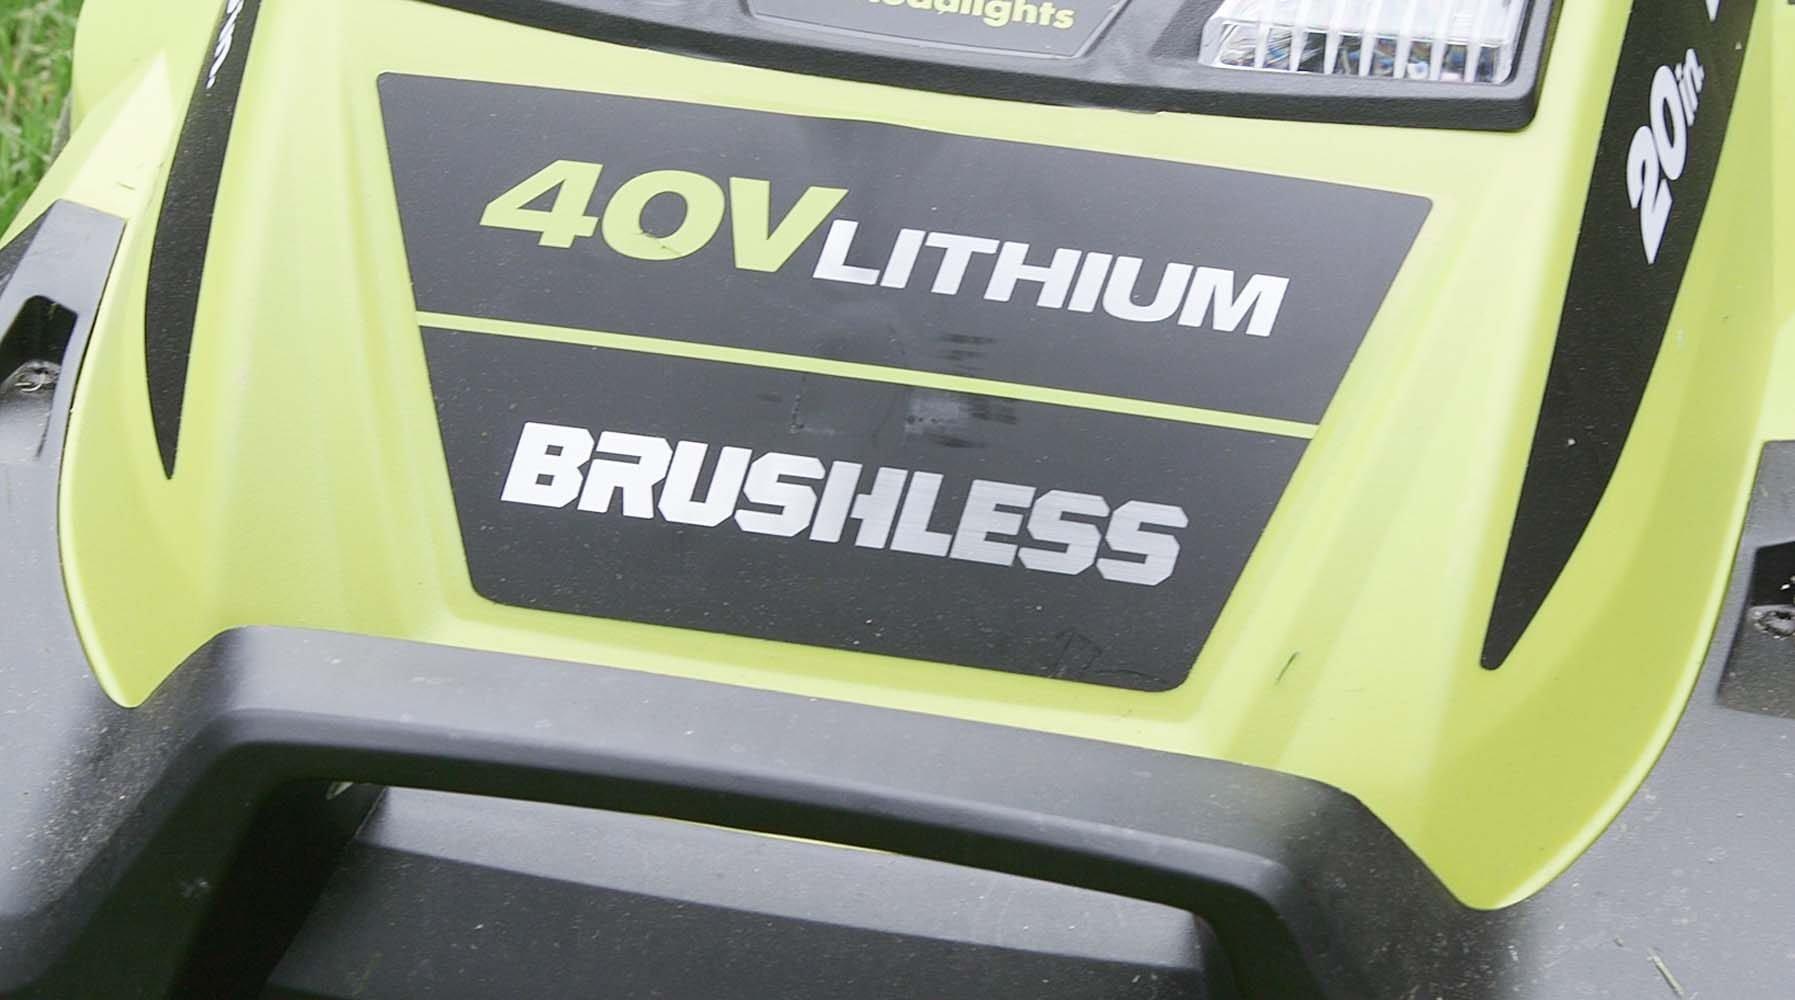 Ryobi Brushless Motor Lawn Mower ryobi 40v mower